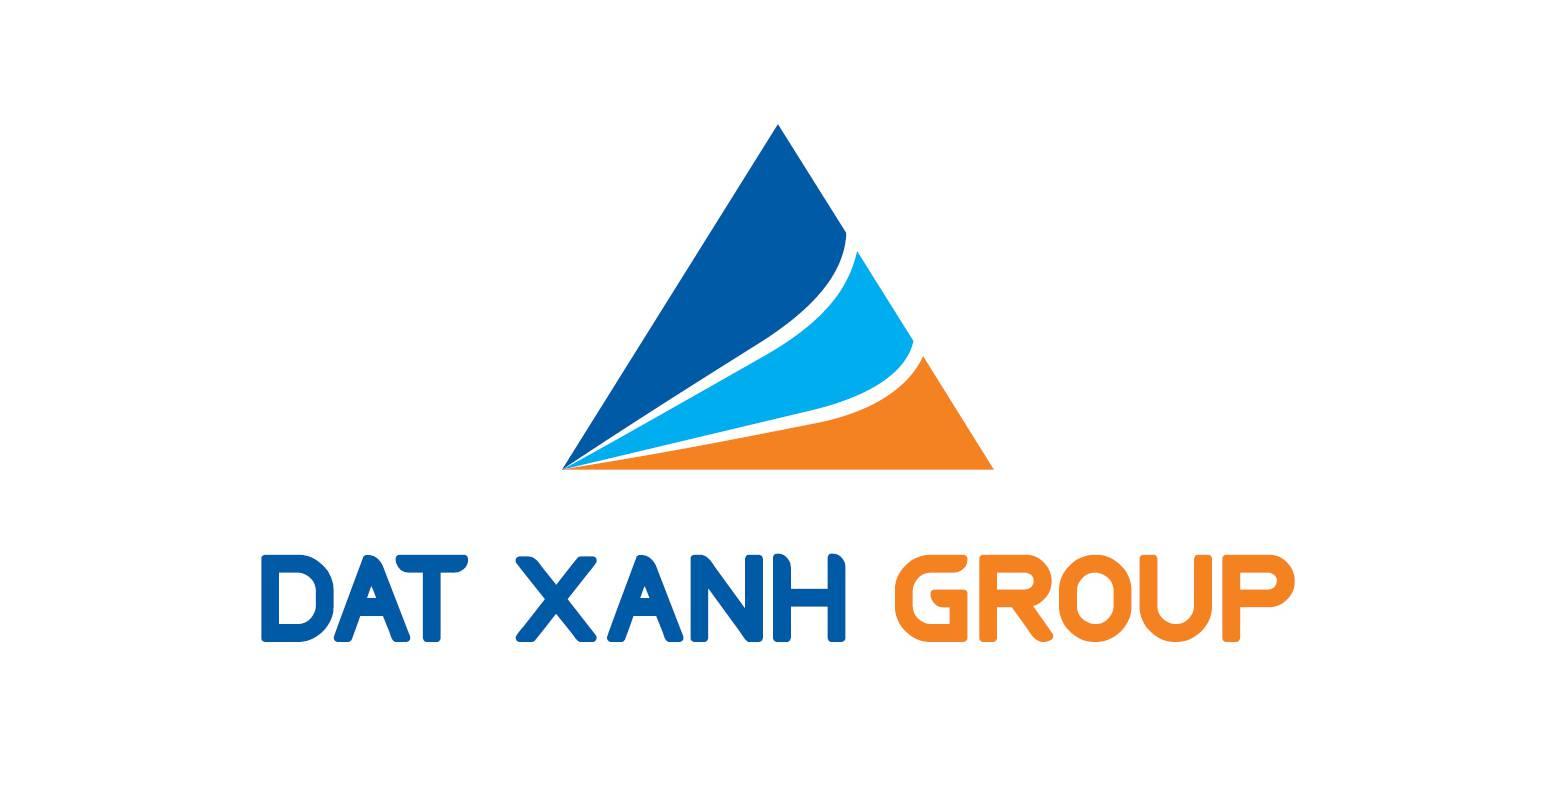 logo dat xanh group